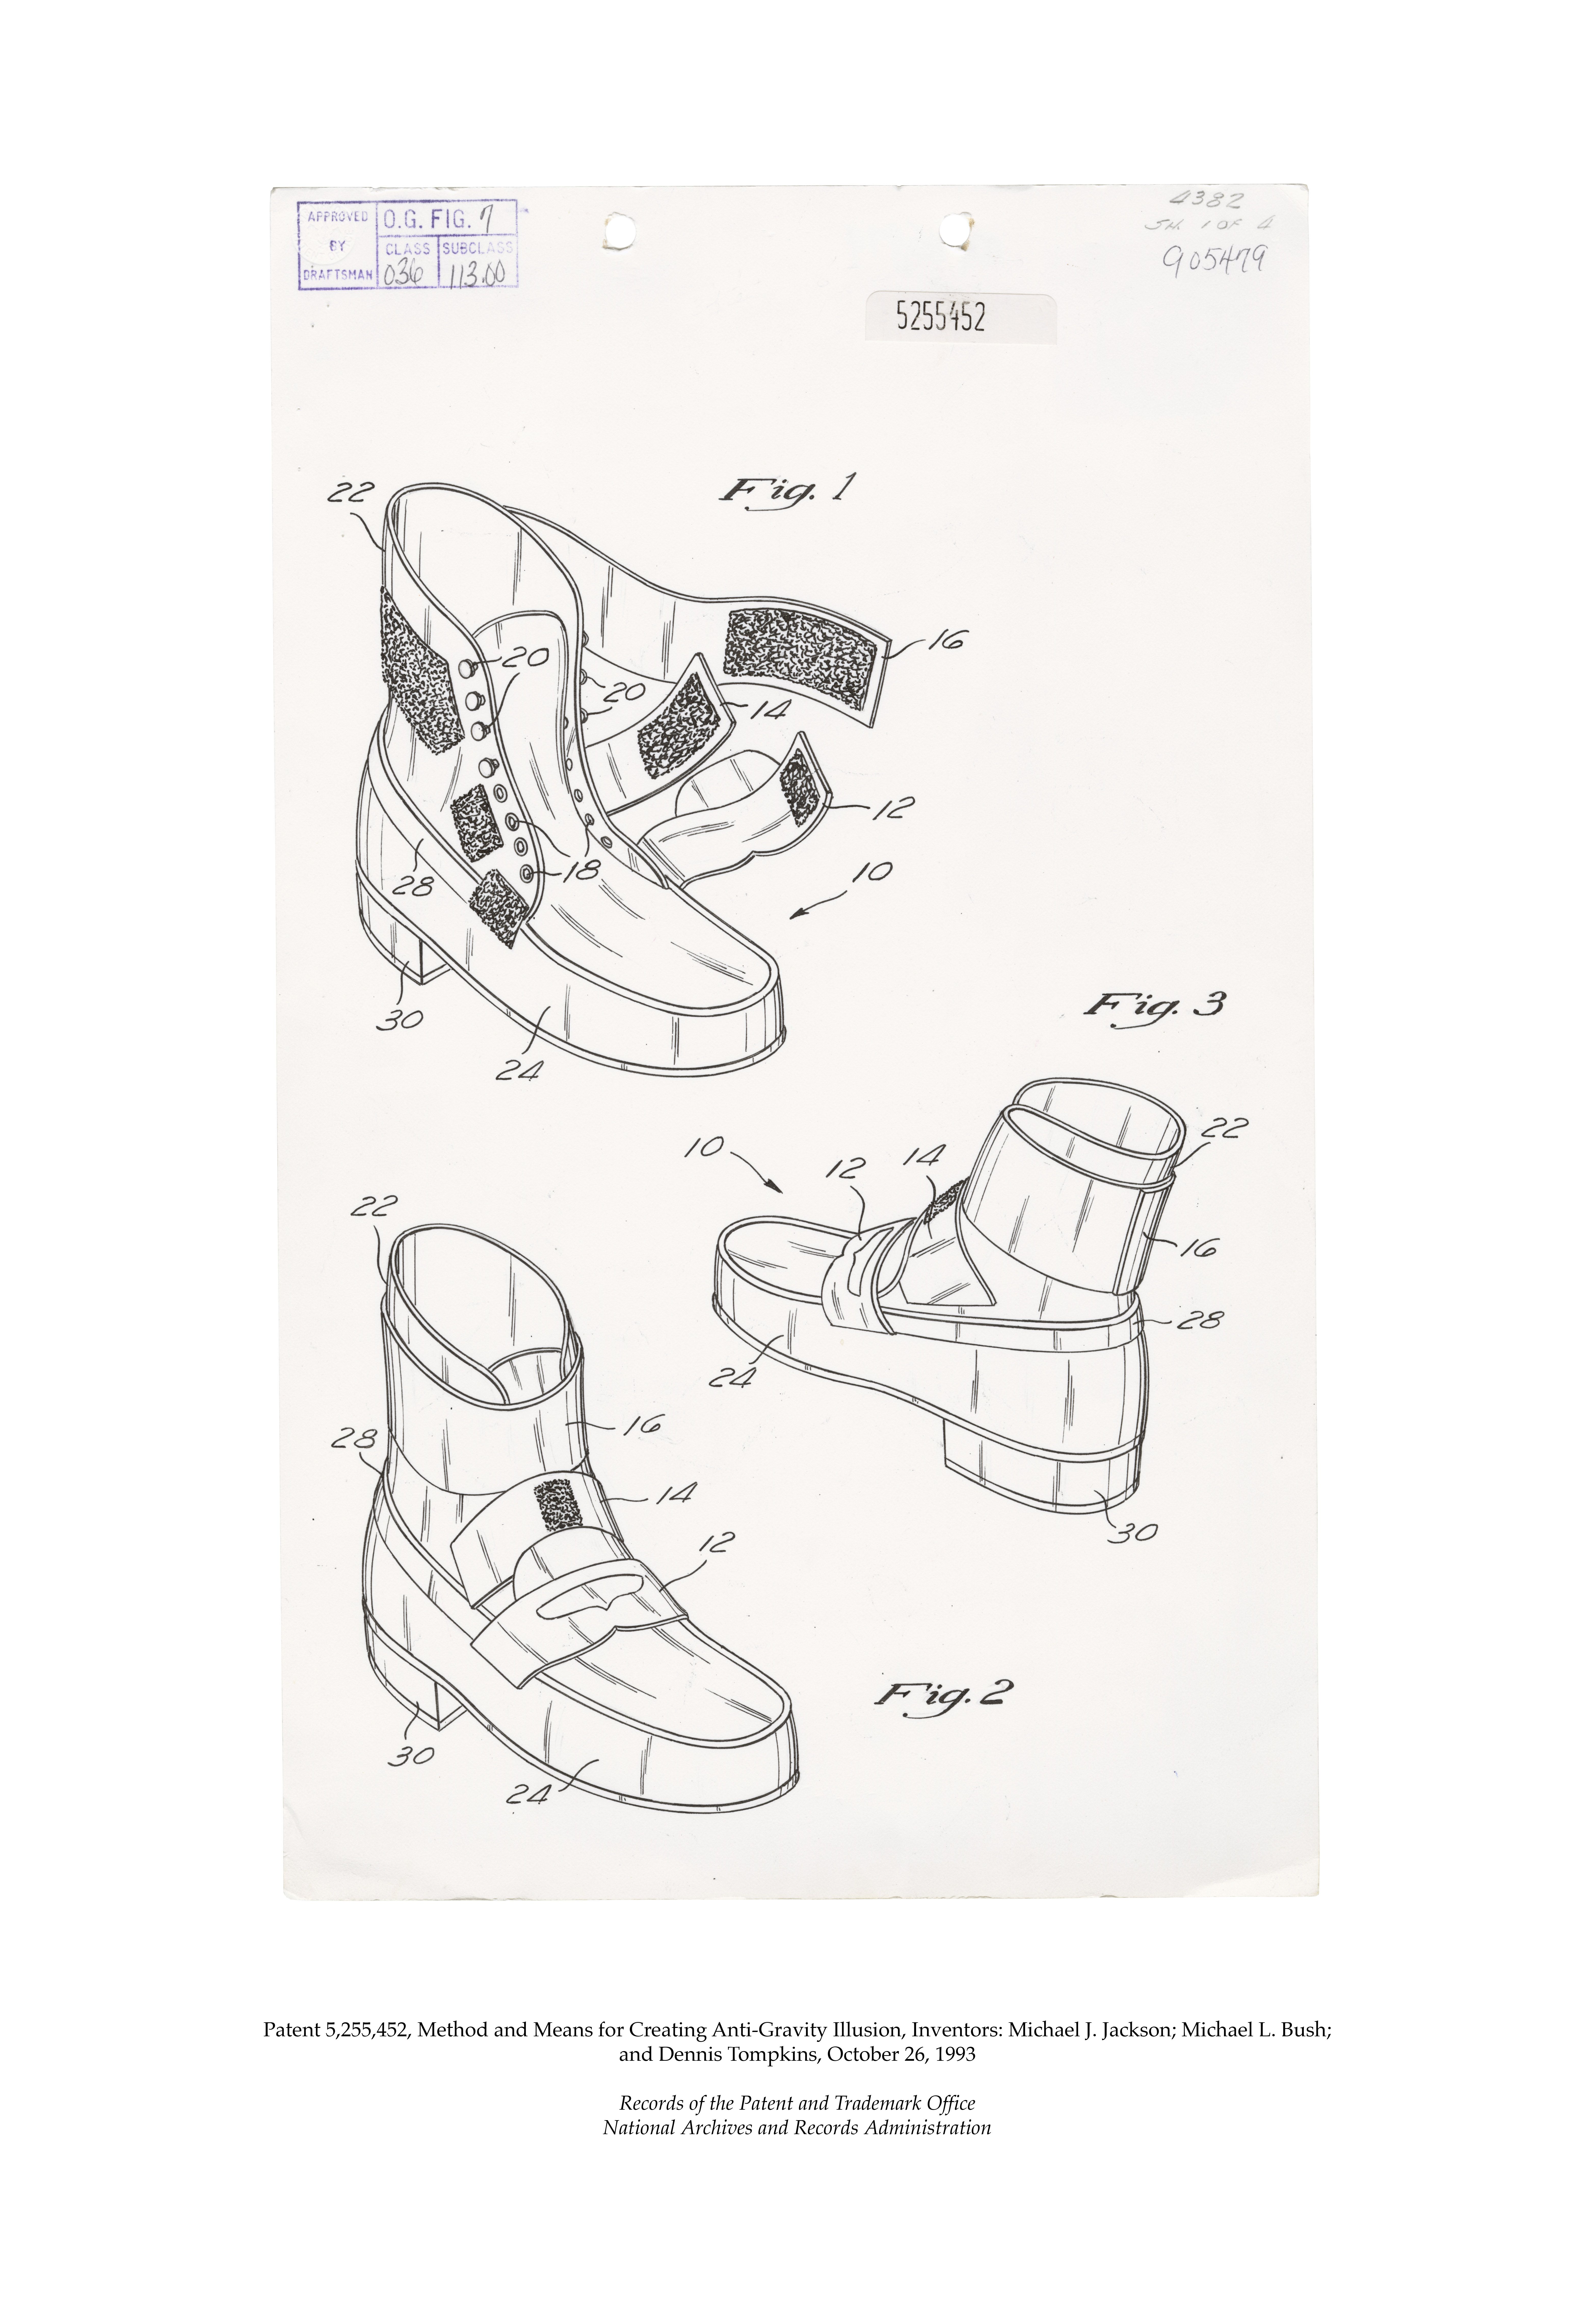 Michael Jackson's AntiGravity Illusion Shoes Patent